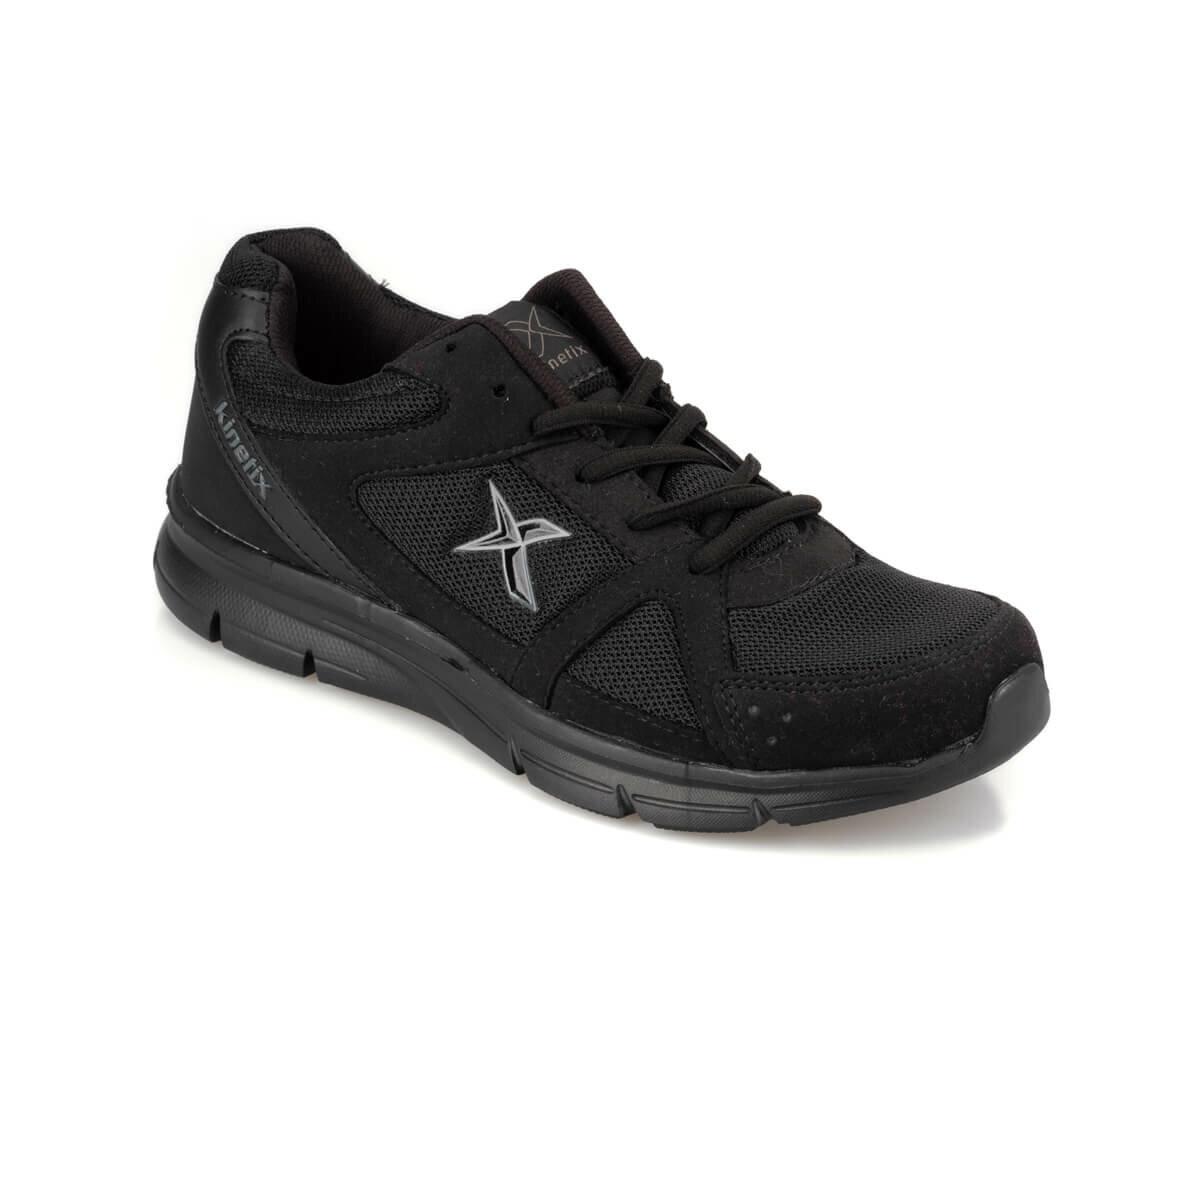 FLO KALEN II TX 9PR Black Women 'S Running Shoe KINETIX